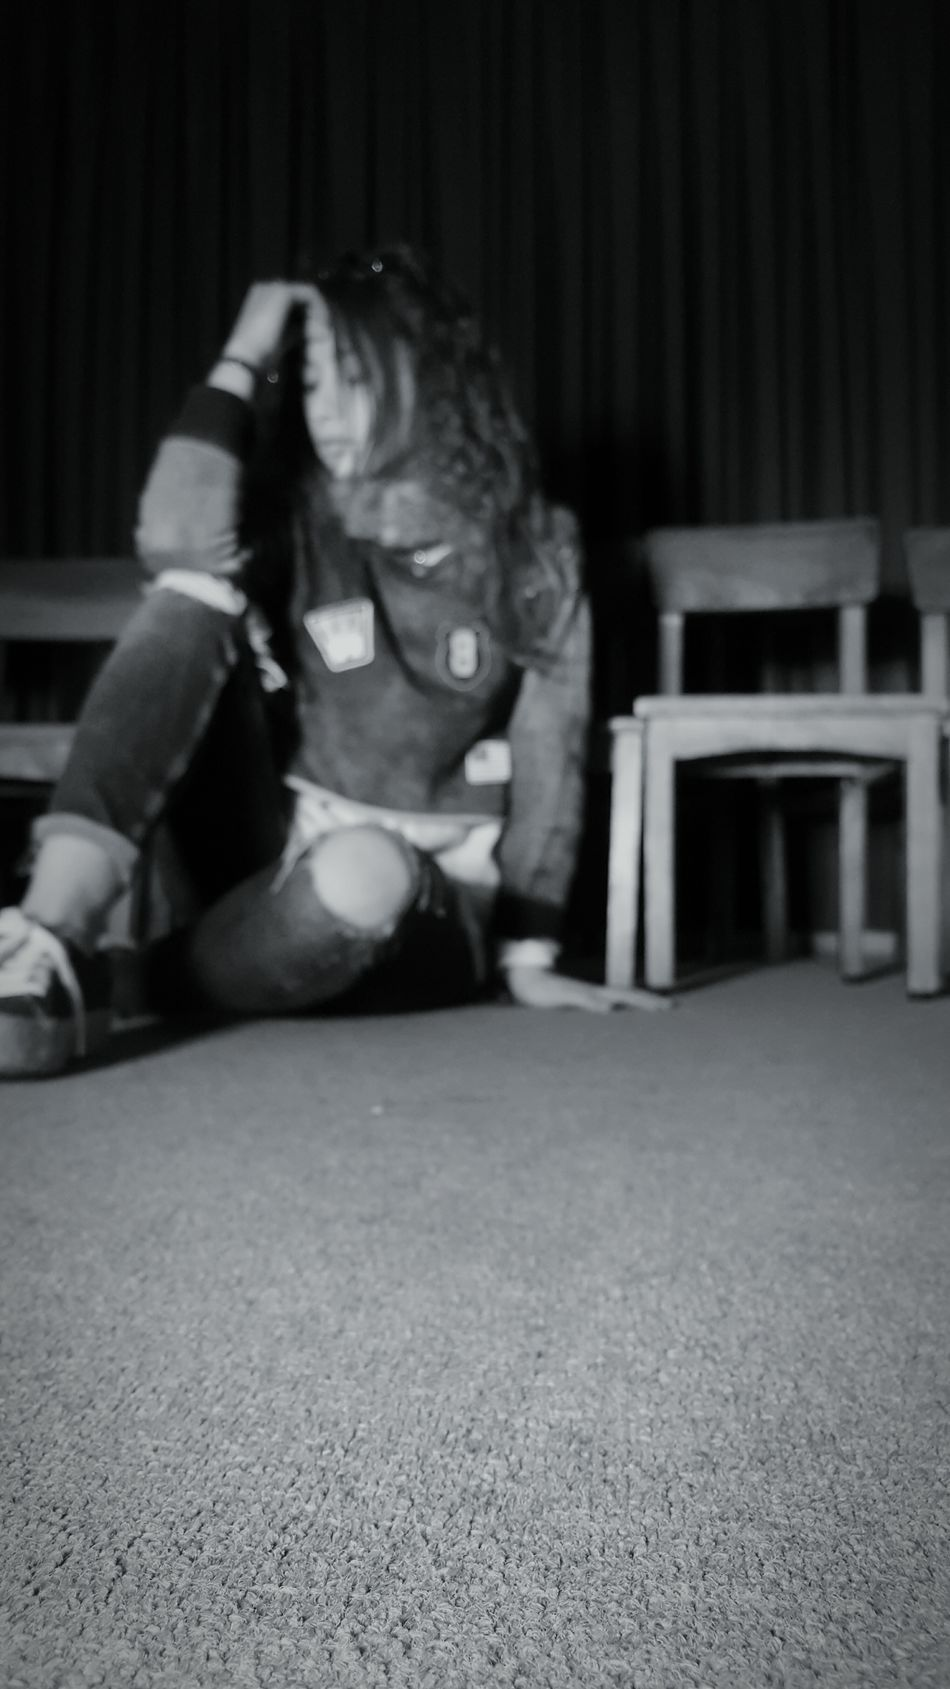 Living on the shadows Me Girl Metalhead Metalheadgirl Alternative Alternativegirl Alternativemood Alternativestyle Alternativo Light Shadow Floor Chairs Sit Sitting Blackandwhite BlackEdition